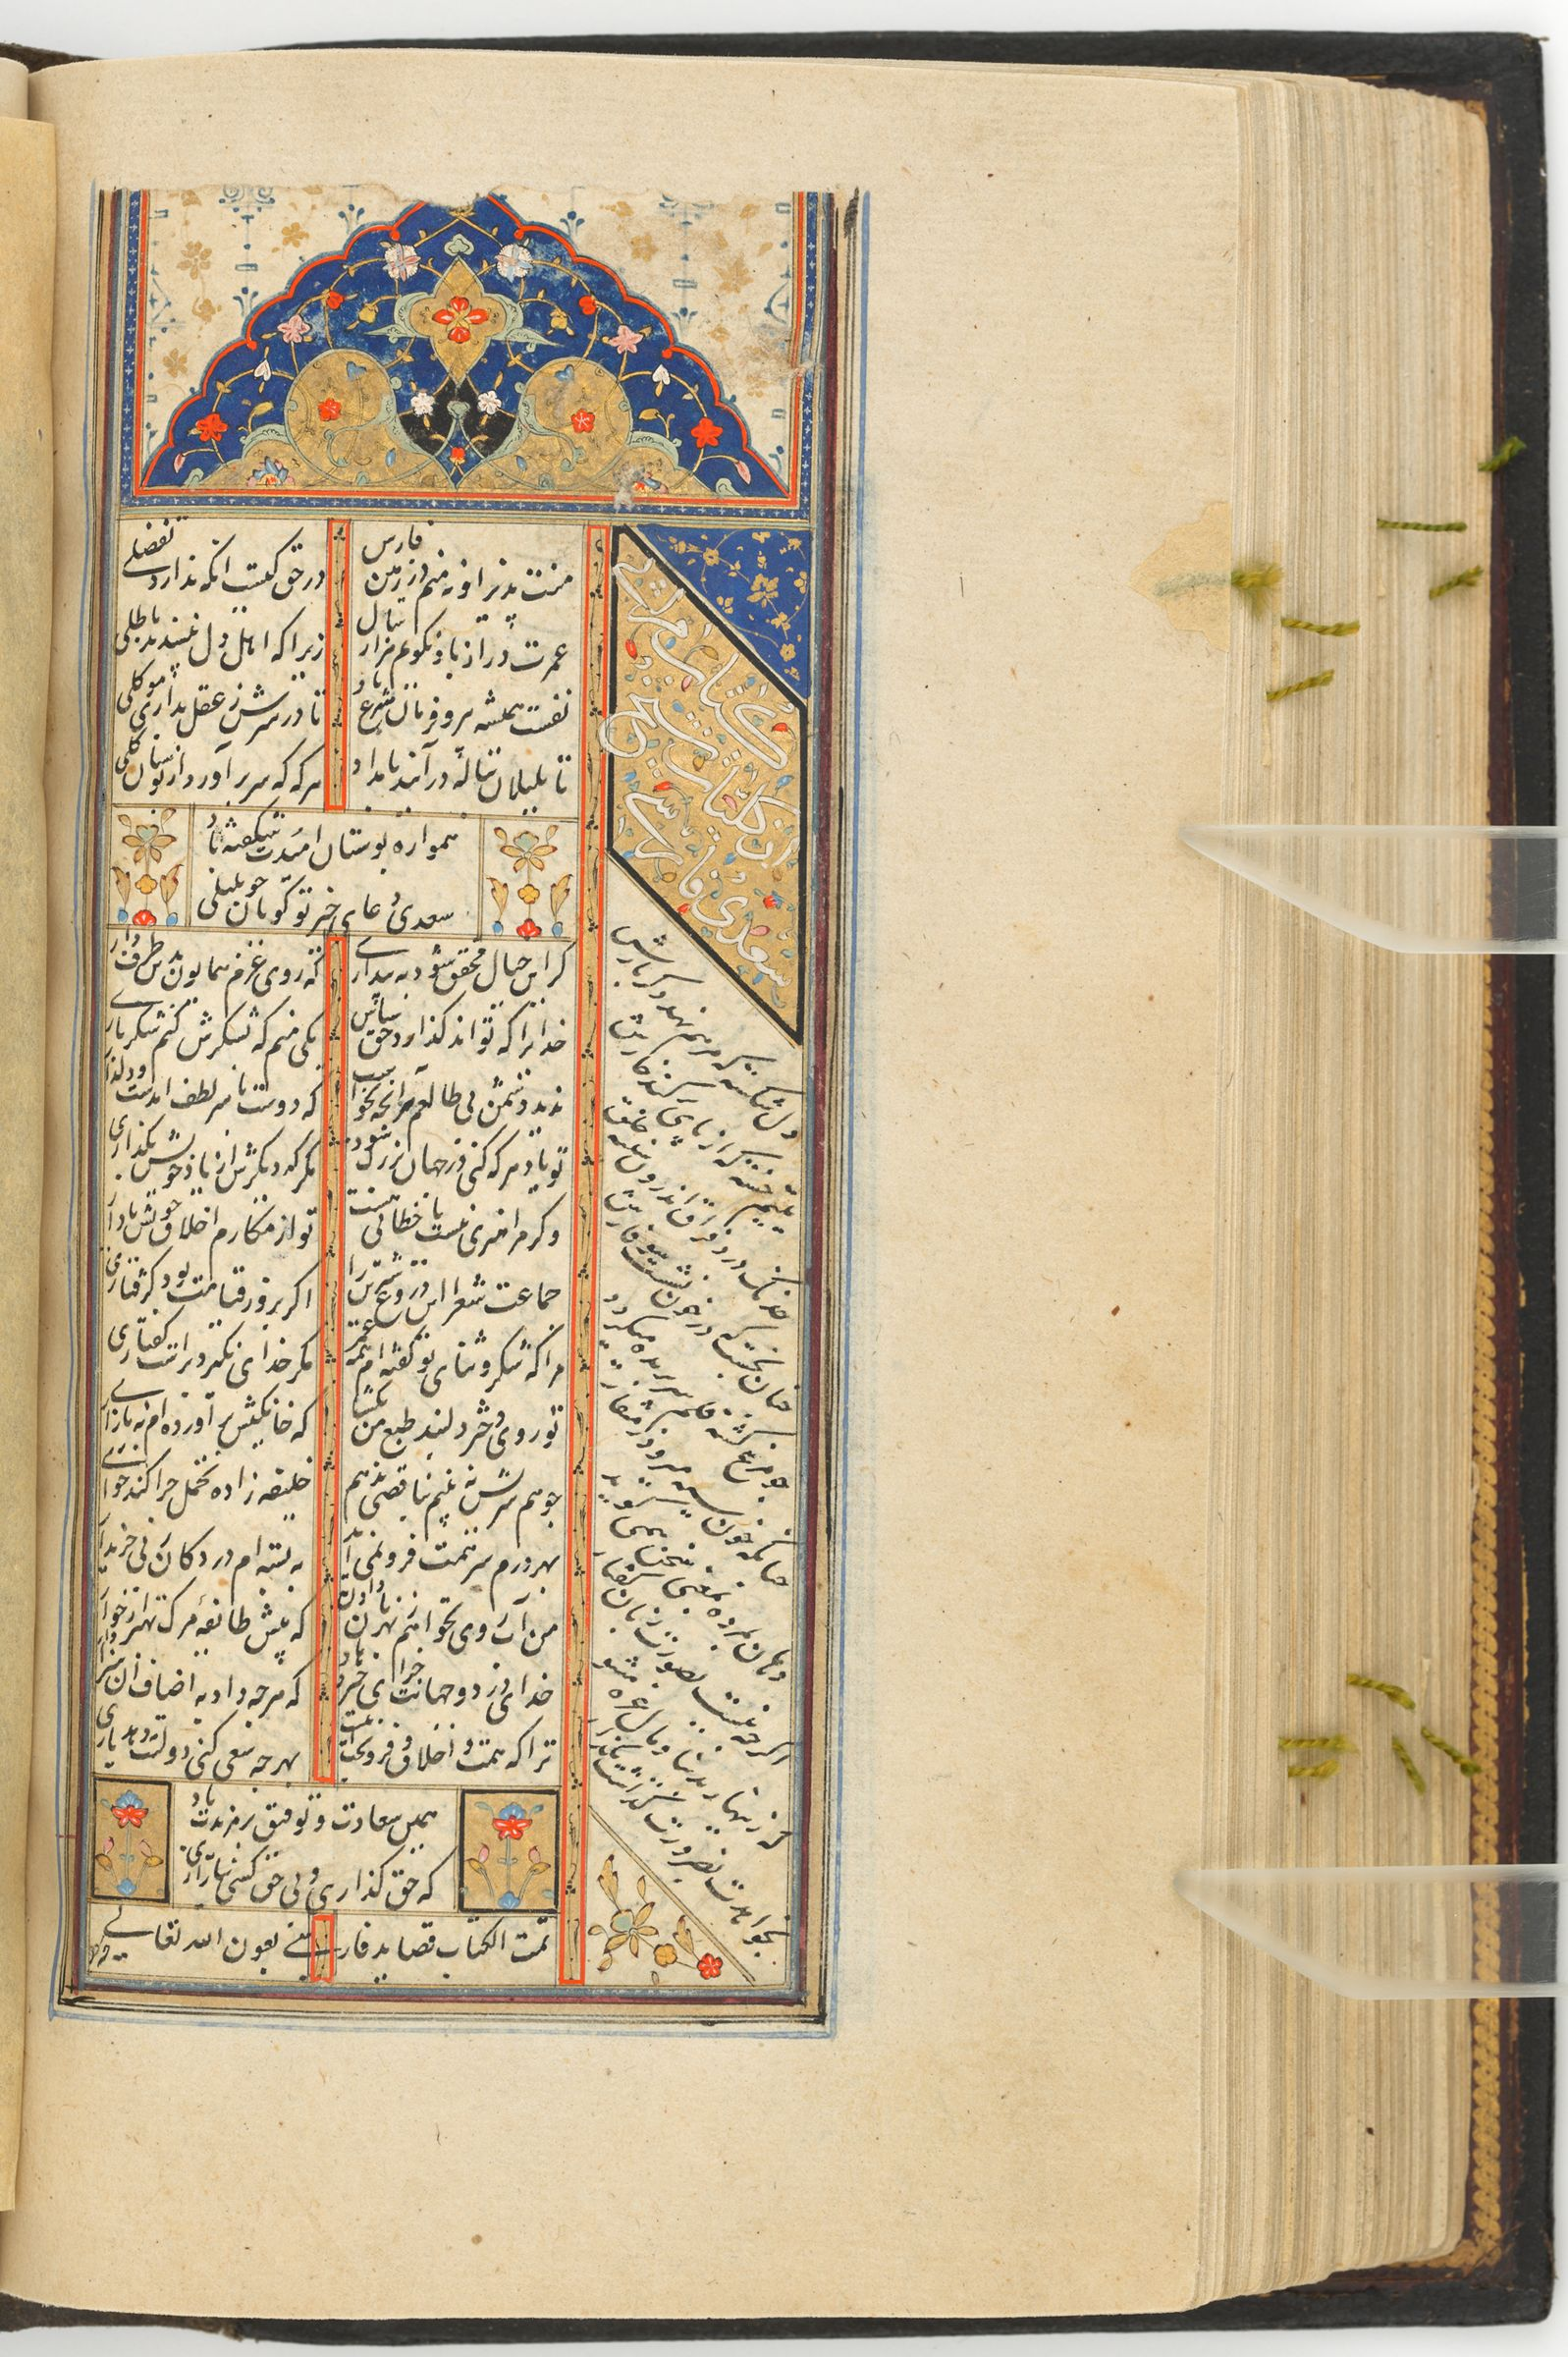 Text Folio With An Illuminated Heading (Text Recto; Text With An Illuminated Heading Verso Of Folio 178), From A Manuscript Of The Kulliyat Of Sa'di